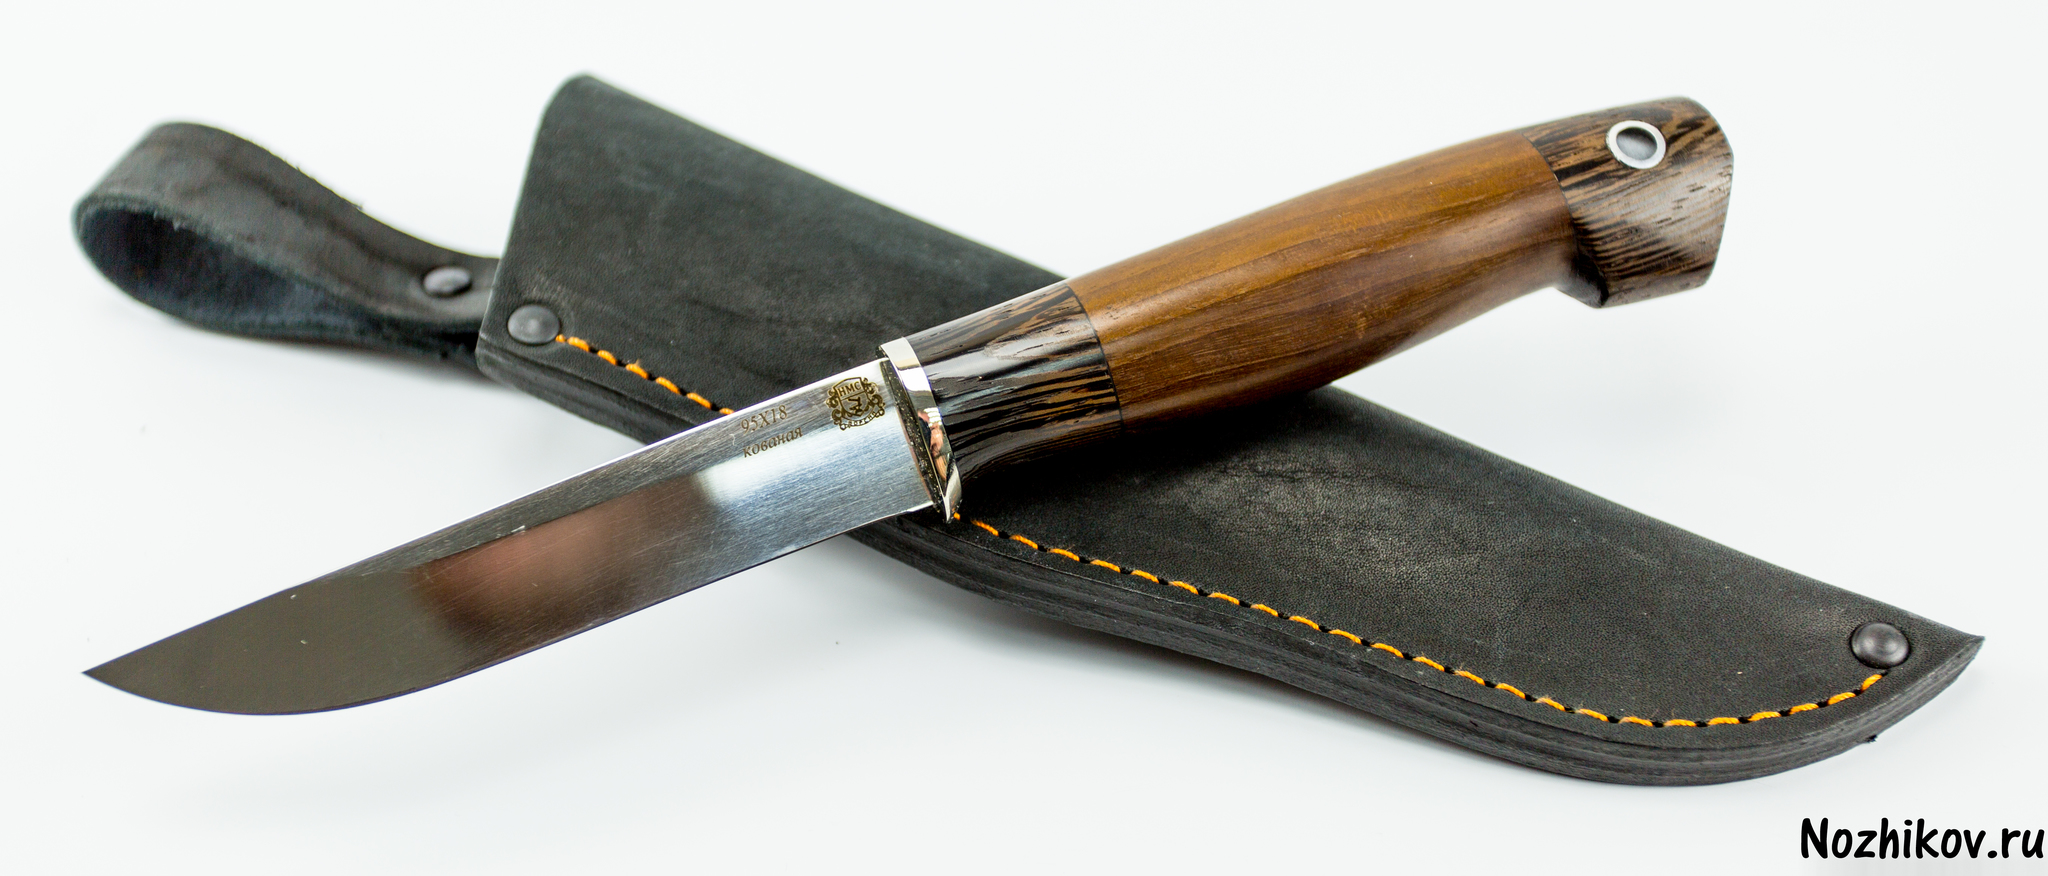 Фото 12 - Нож Финский, 95Х18 от Мастерская Сковородихина